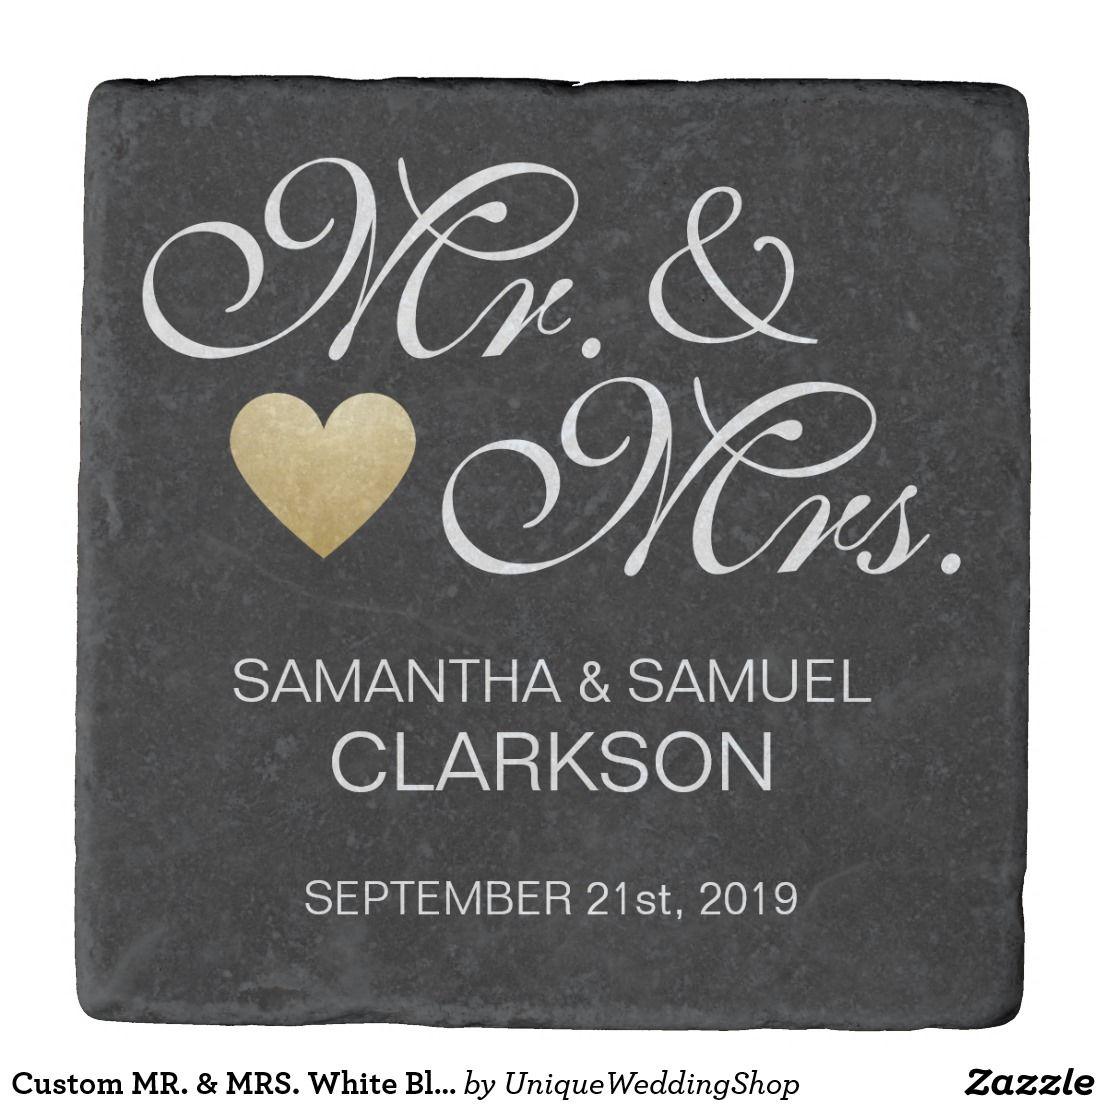 Custom mr u mrs white black heart wedding favors stone coaster